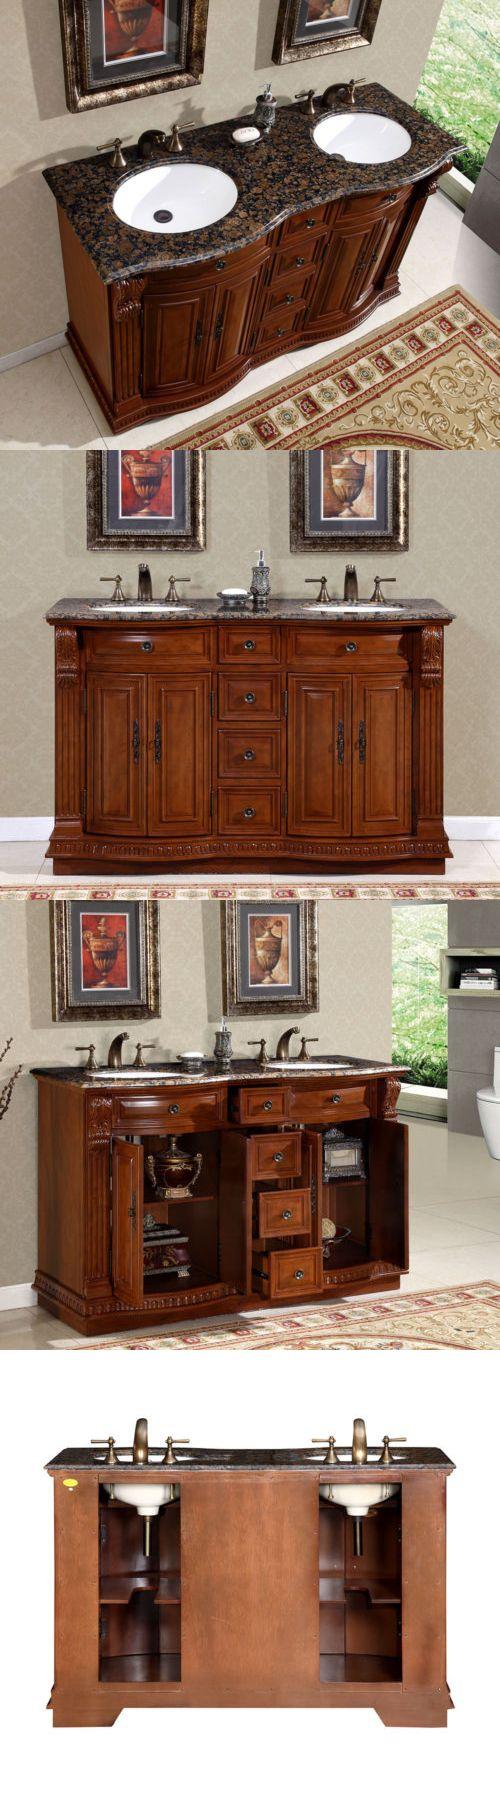 Gemini 59 inch modern single sink vanity set free shipping today - Vanities 115625 55 Granite Stone Top Bathroom Vanity Cabinet Furniture Double White Sink 223bb